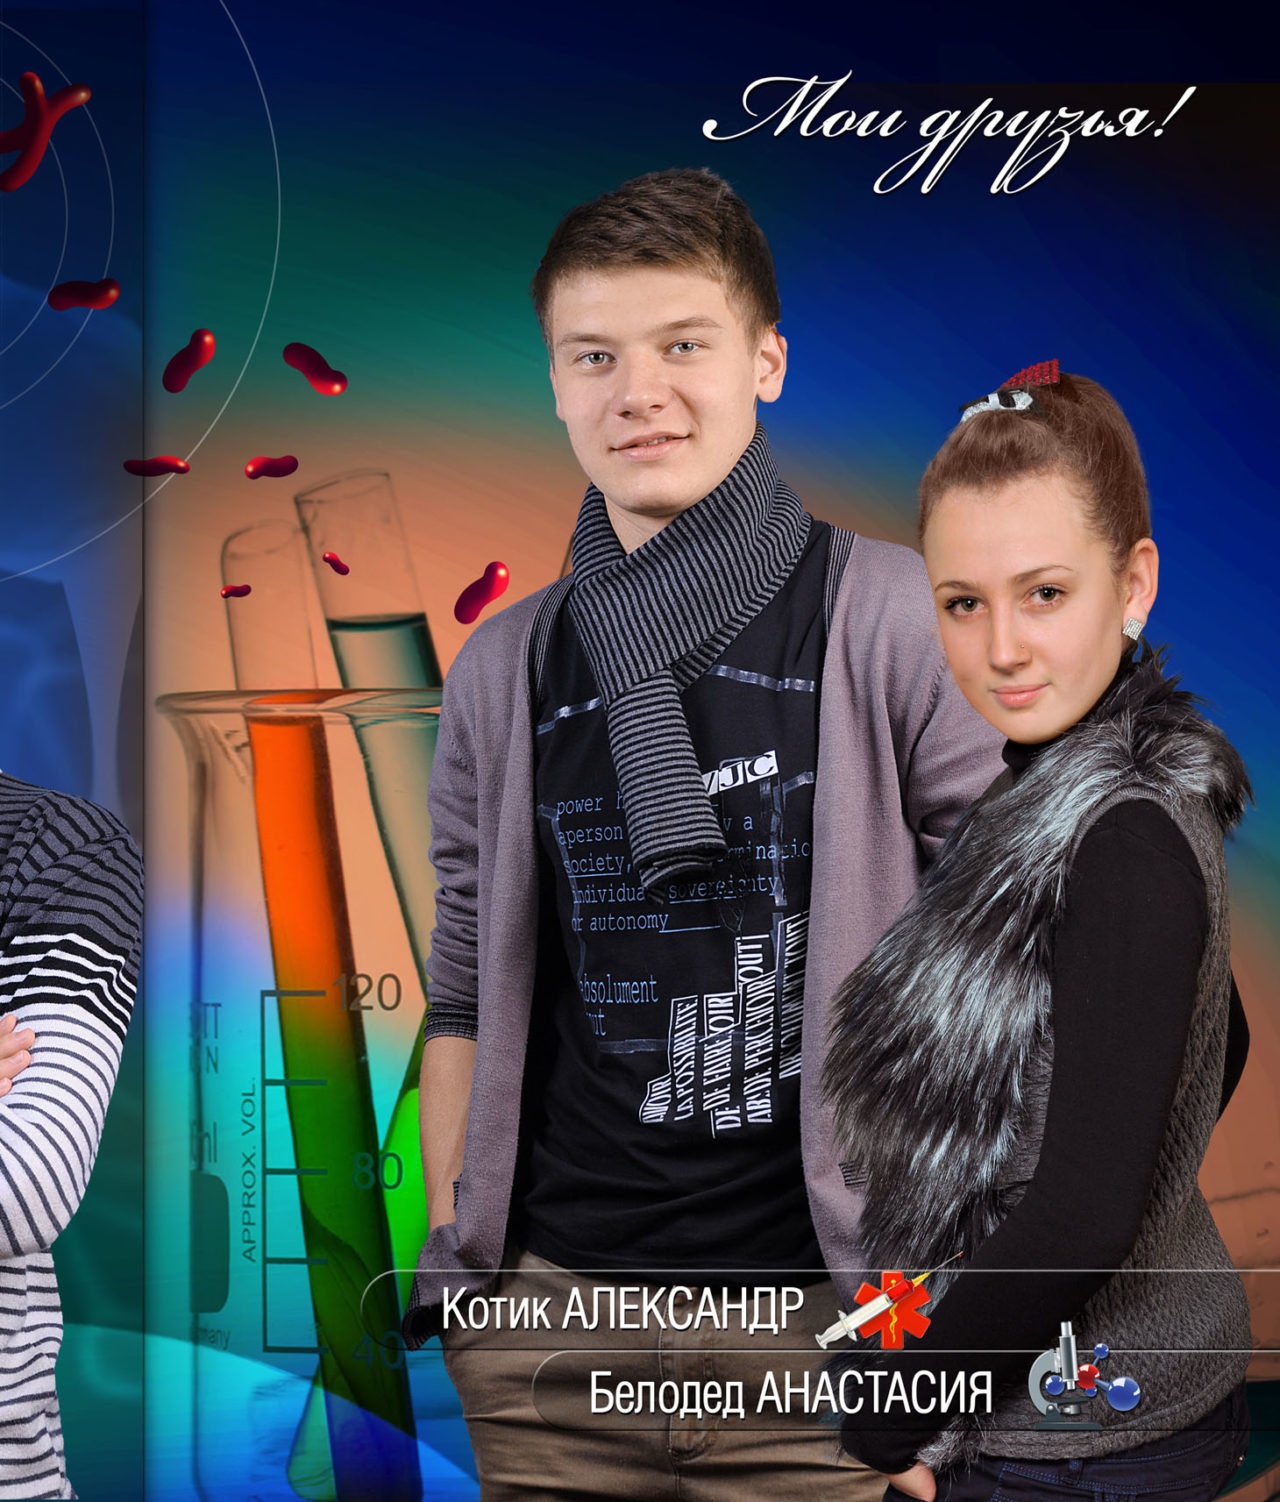 https://school-photo.com.ua/wp-content/uploads/2017/08/8-1280x1502.jpg